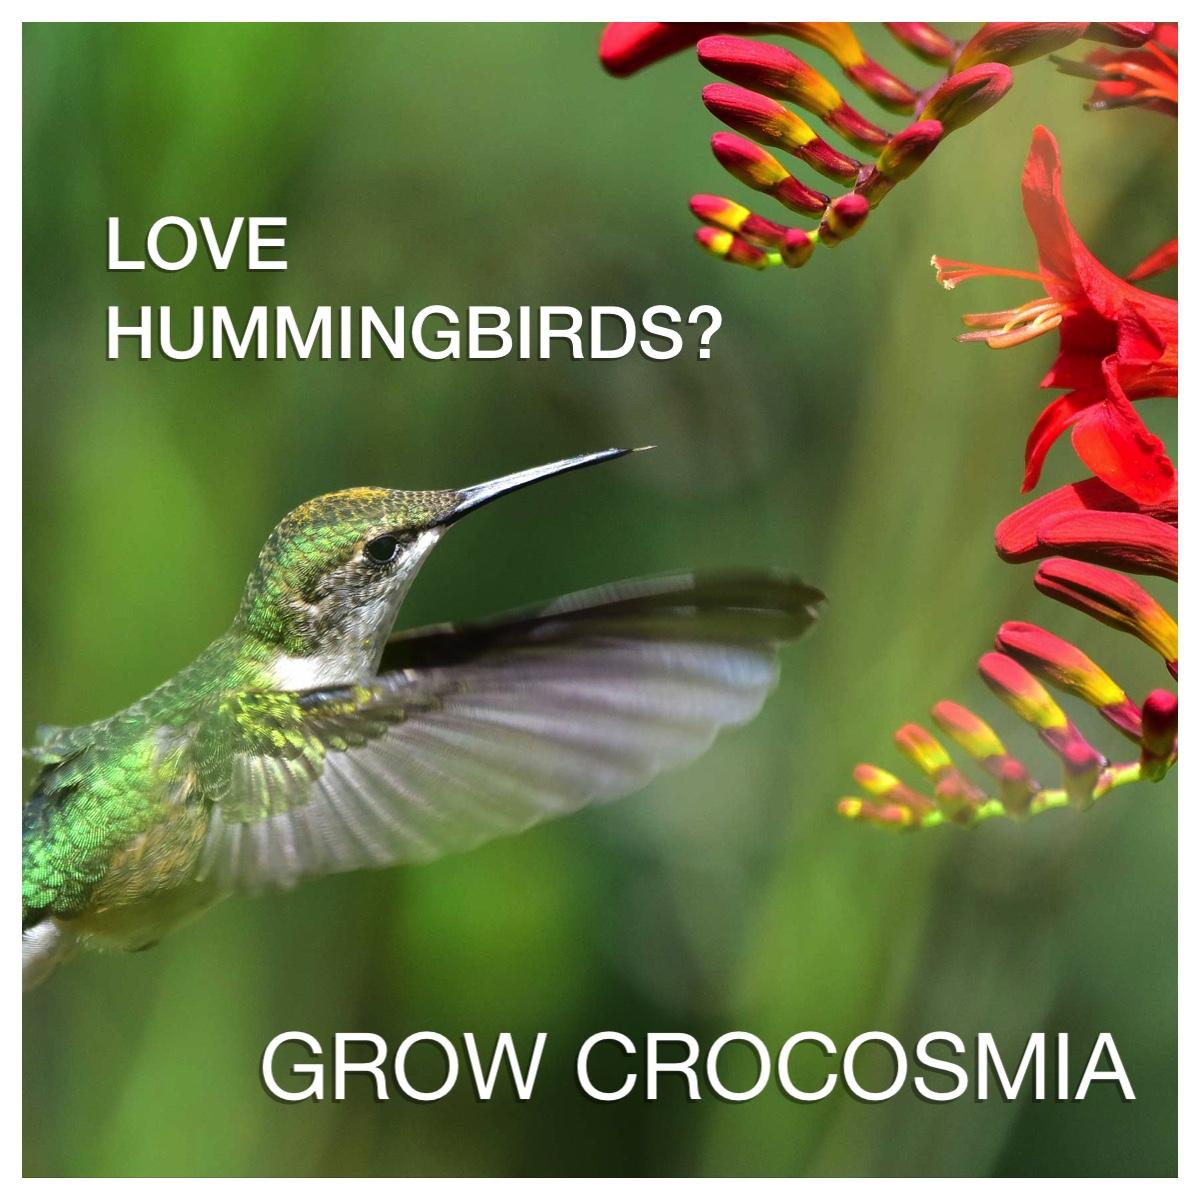 Grow Crocosmia for Hummingbirds - Longfield Gardens